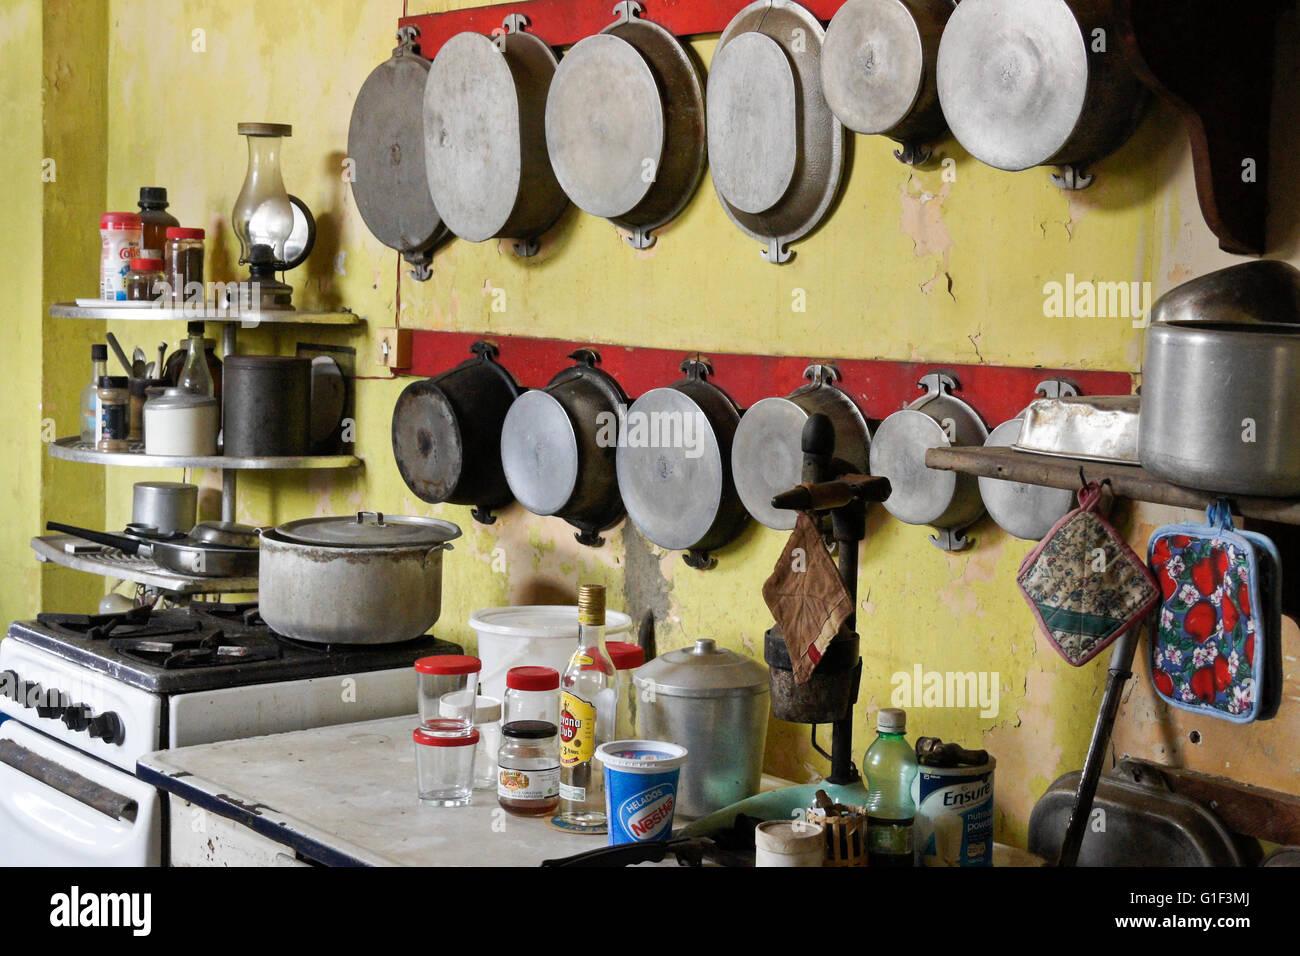 Kitchen of old mansion in Vedado neighborhood, Havana, Cuba - Stock Image